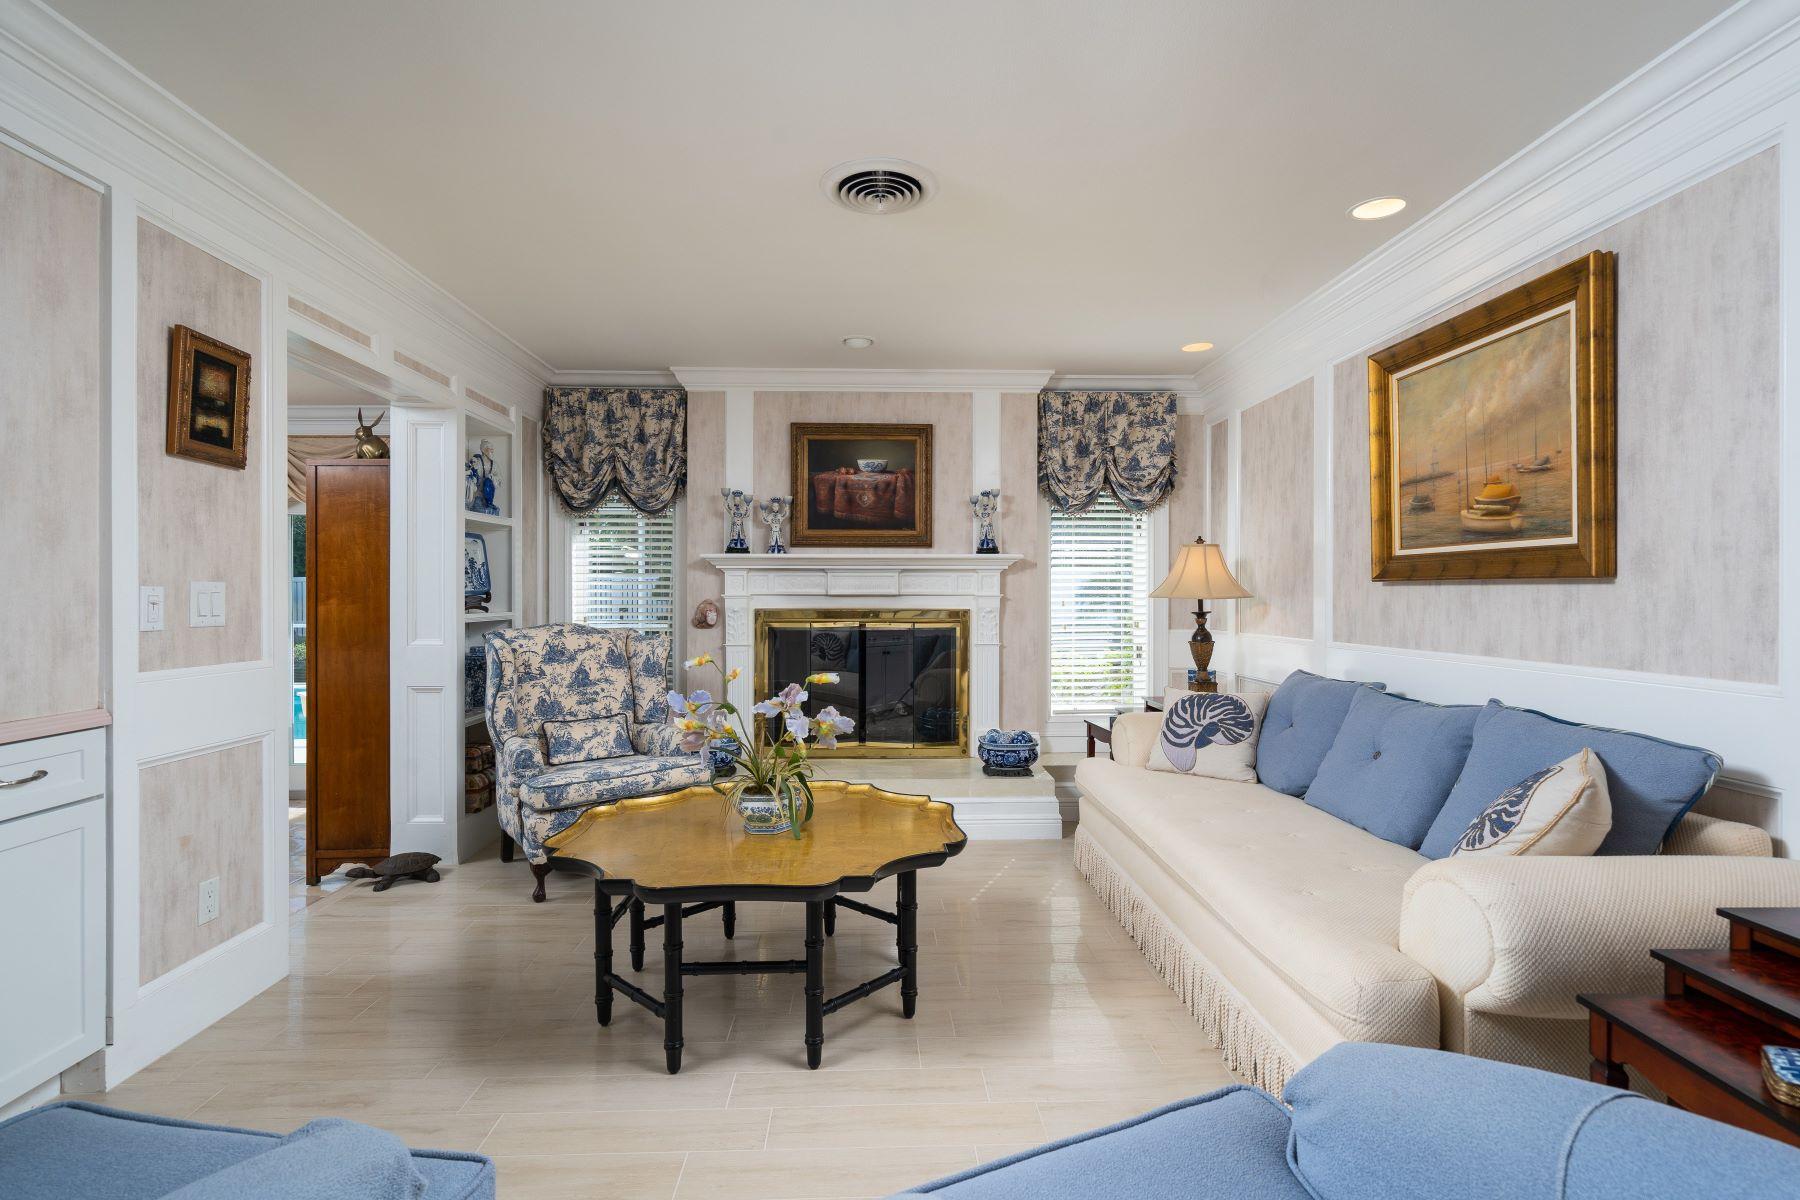 Single Family Homes для того Продажа на 935 Pebble Lane Vero Beach, Флорида 32963 Соединенные Штаты